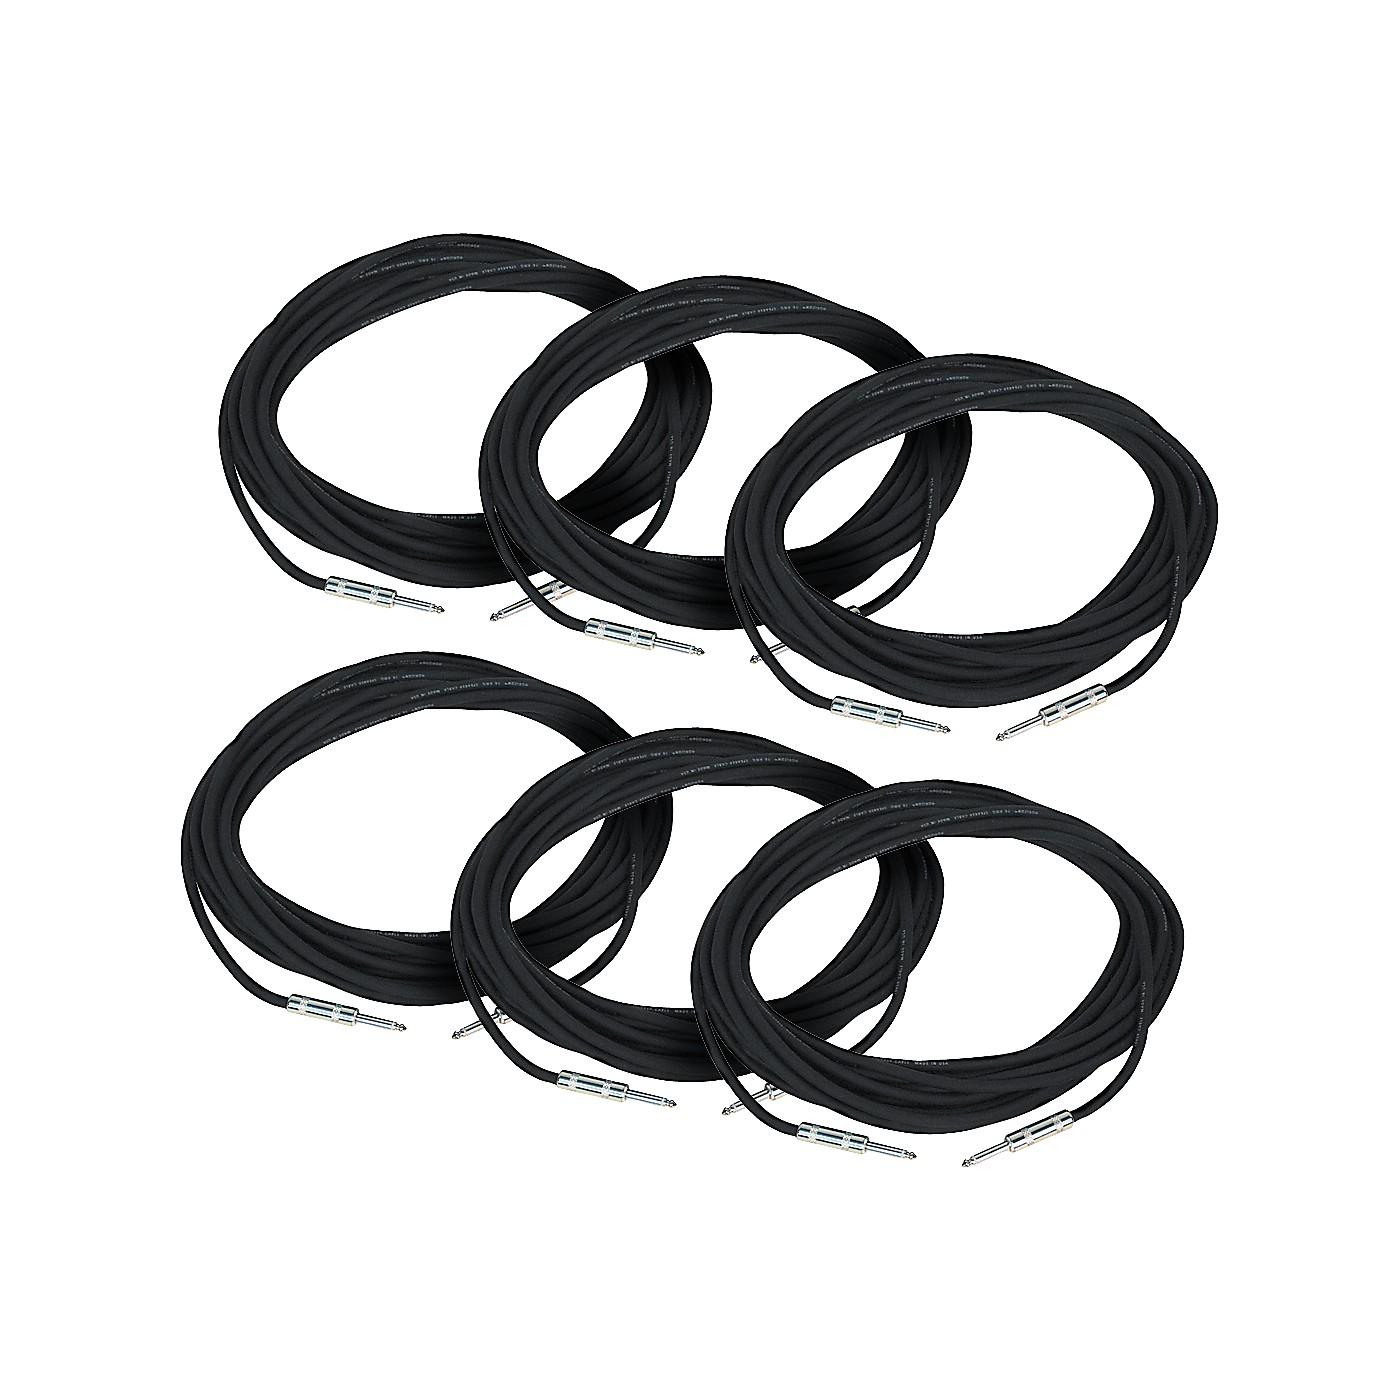 Rapco Horizon Speaker Cable 18-Gauge 20 Feet 6-Pack thumbnail